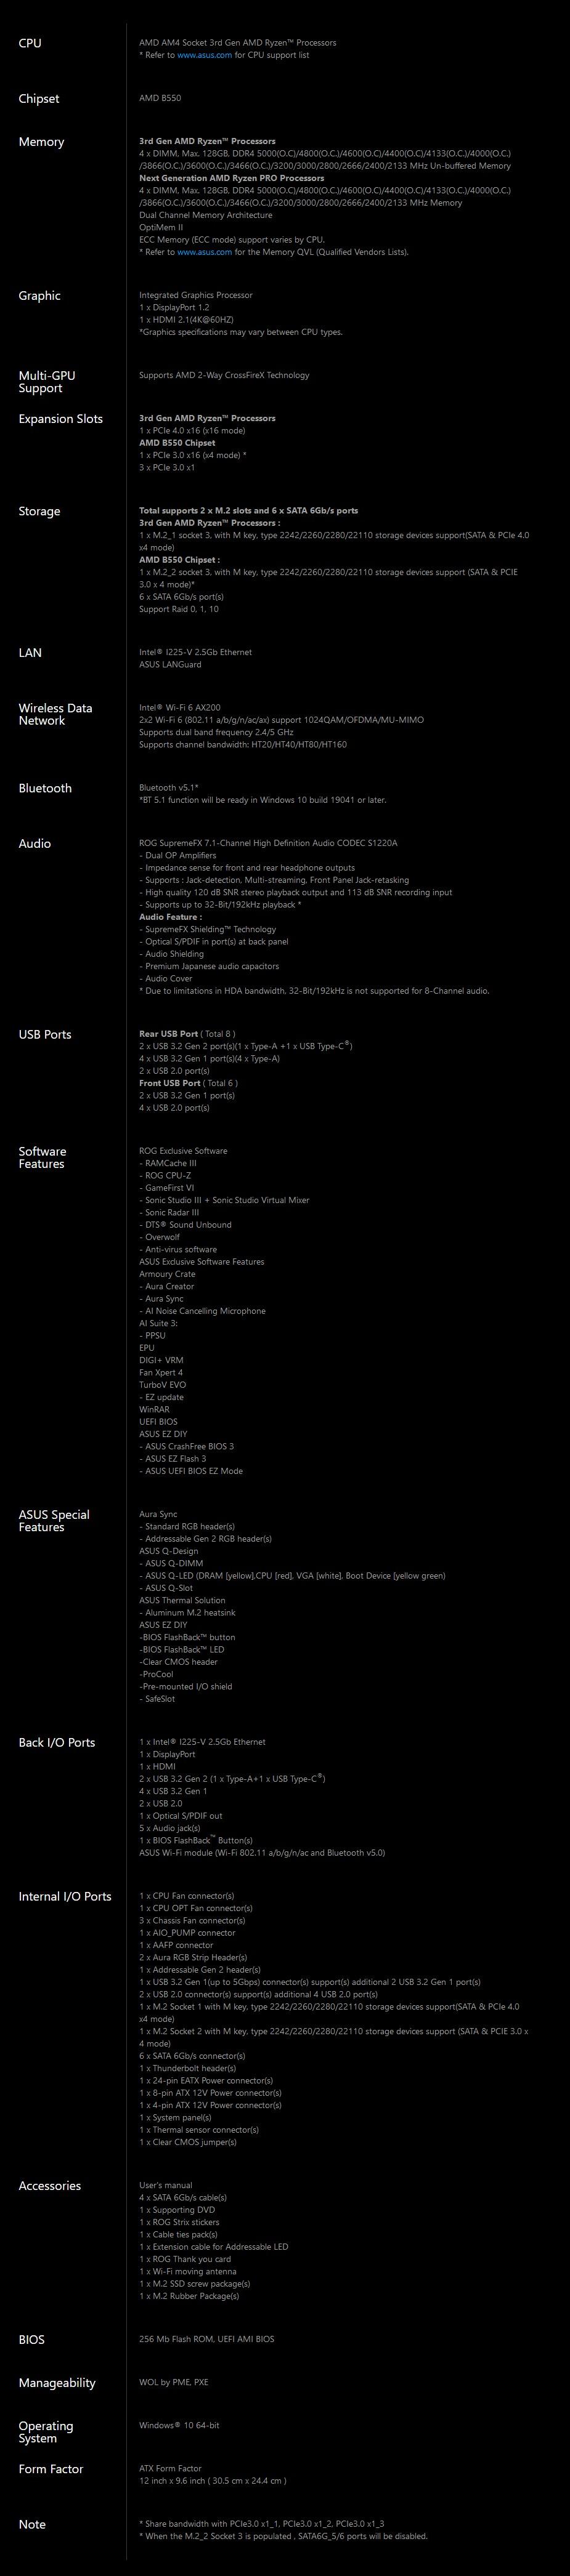 asus-rog-strix-b550f-gaming-wifi-am4-atx-motherboard-ac35544-6-1-.jpg